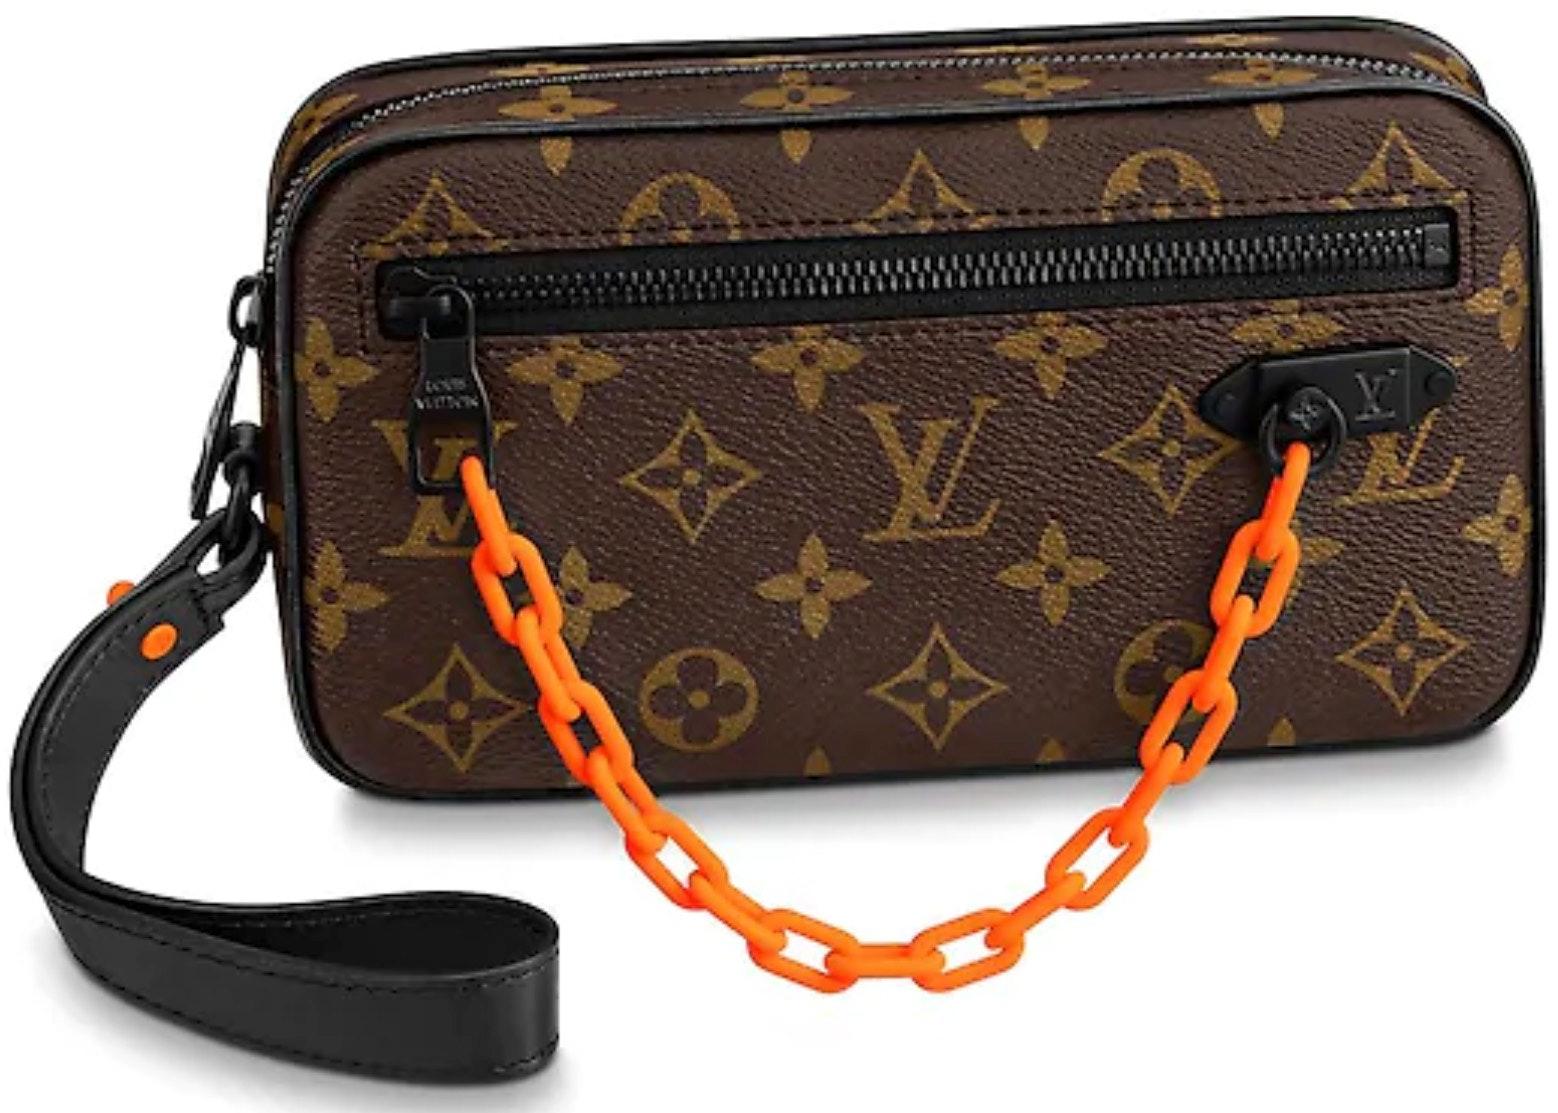 Louis Vuitton Pochette Volga Monogram Brown